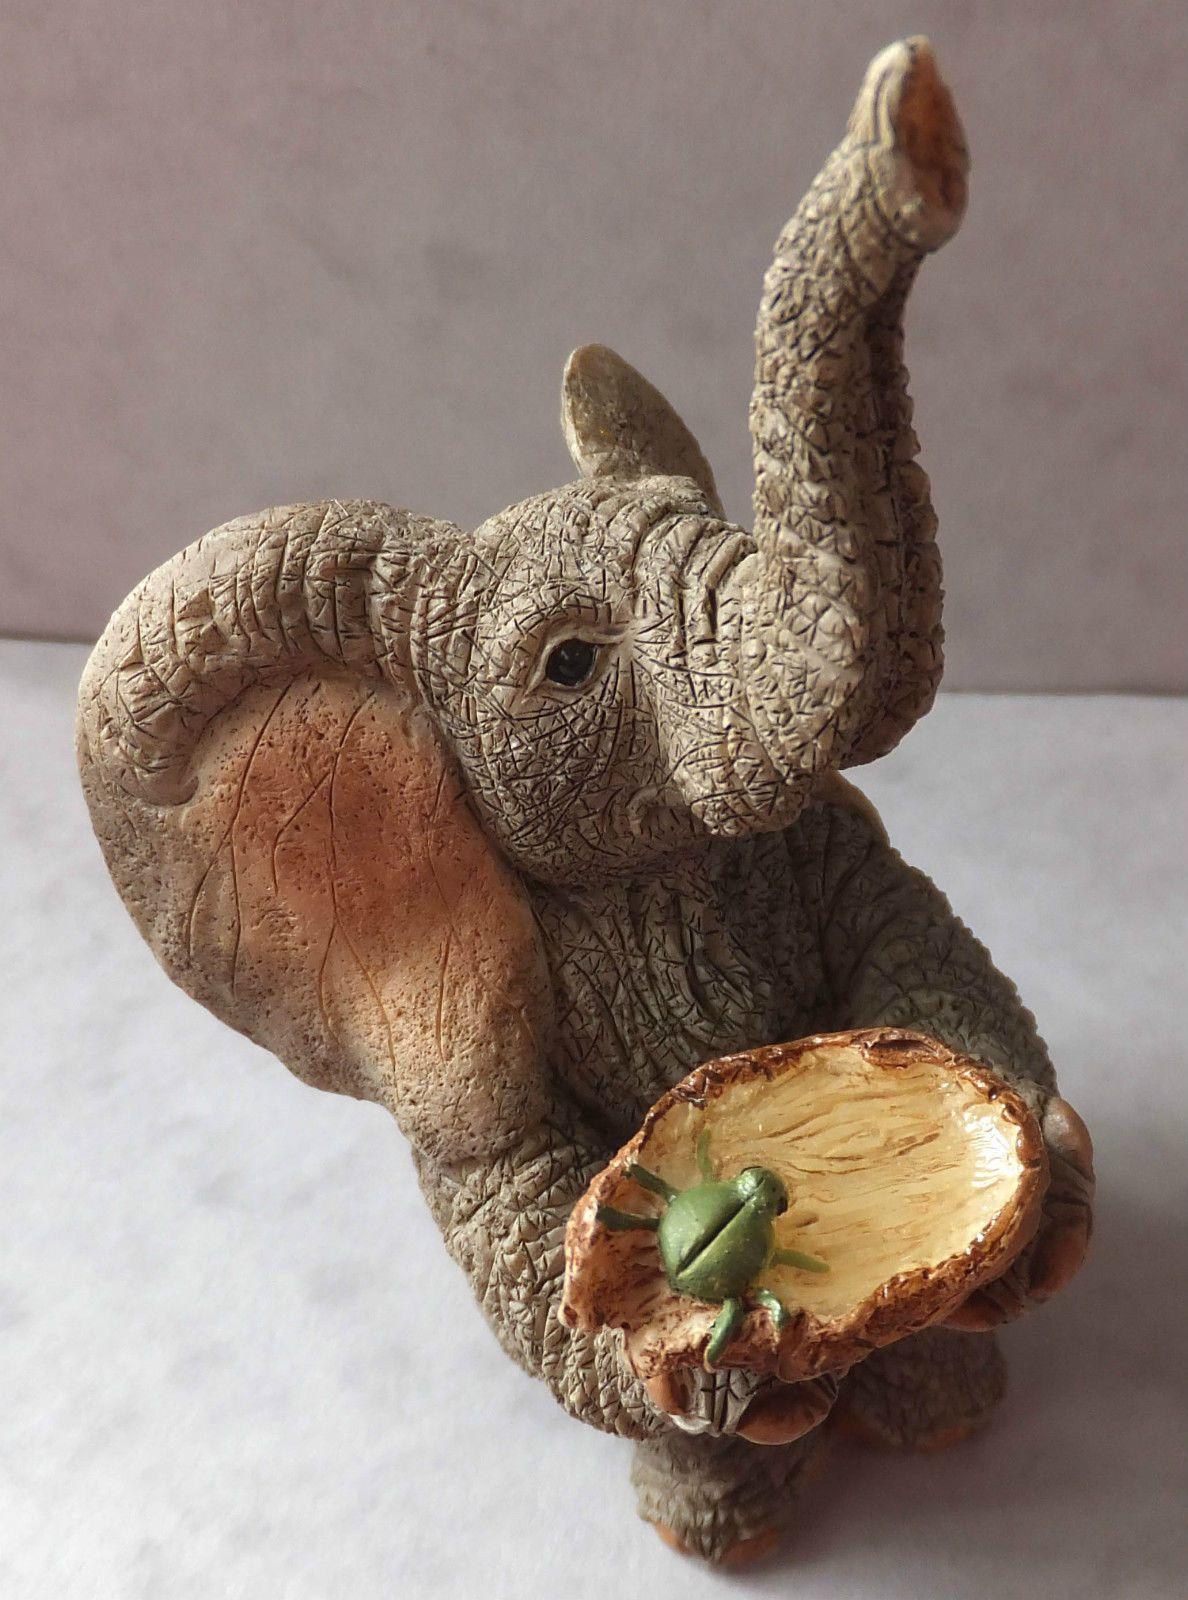 Superb Paw Prints, Tuskers Elephant Figurine William 1998